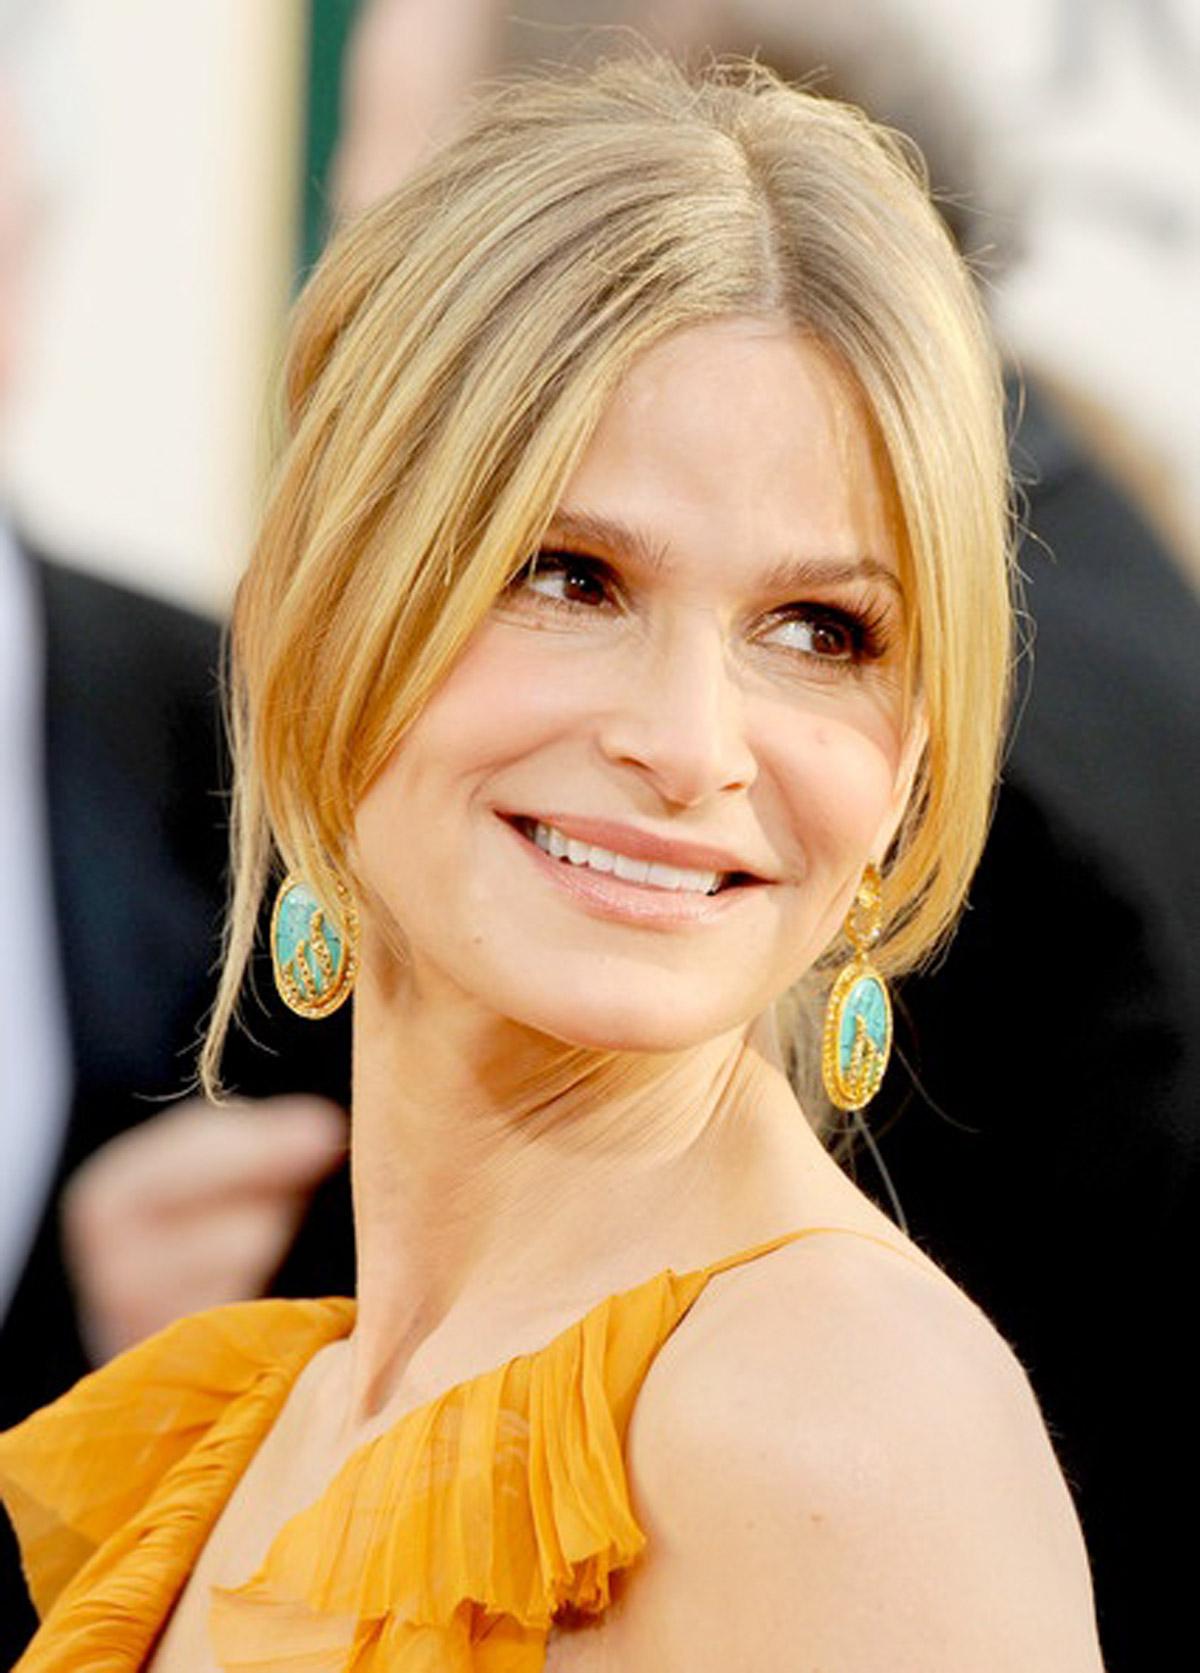 Kyra Sedgwick's Golden Globes Look